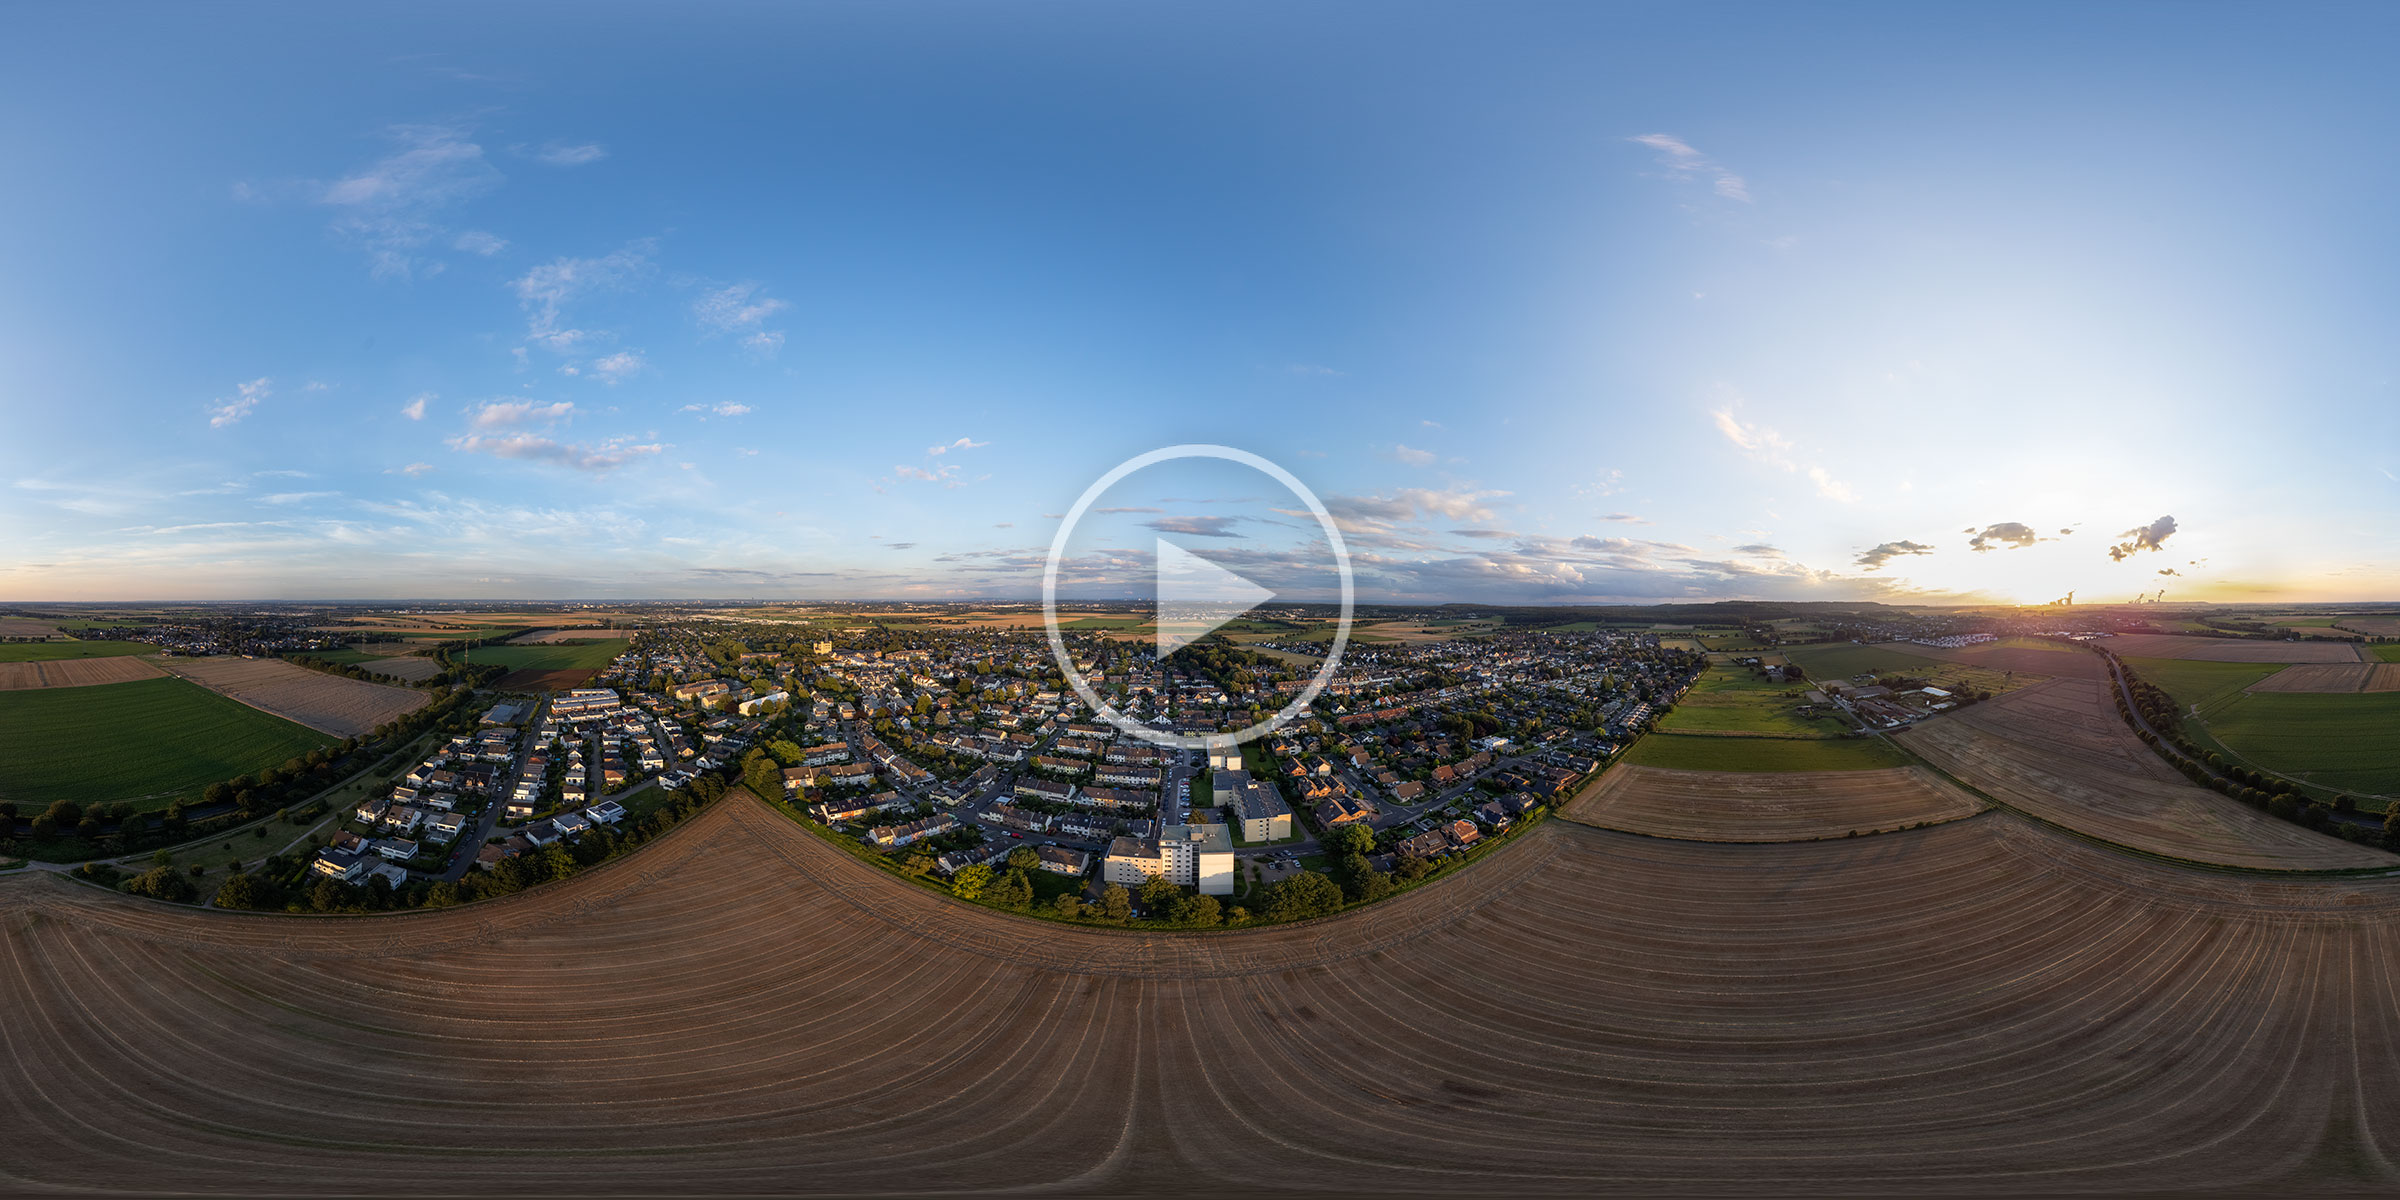 Brauweiler Luftbildpanorama